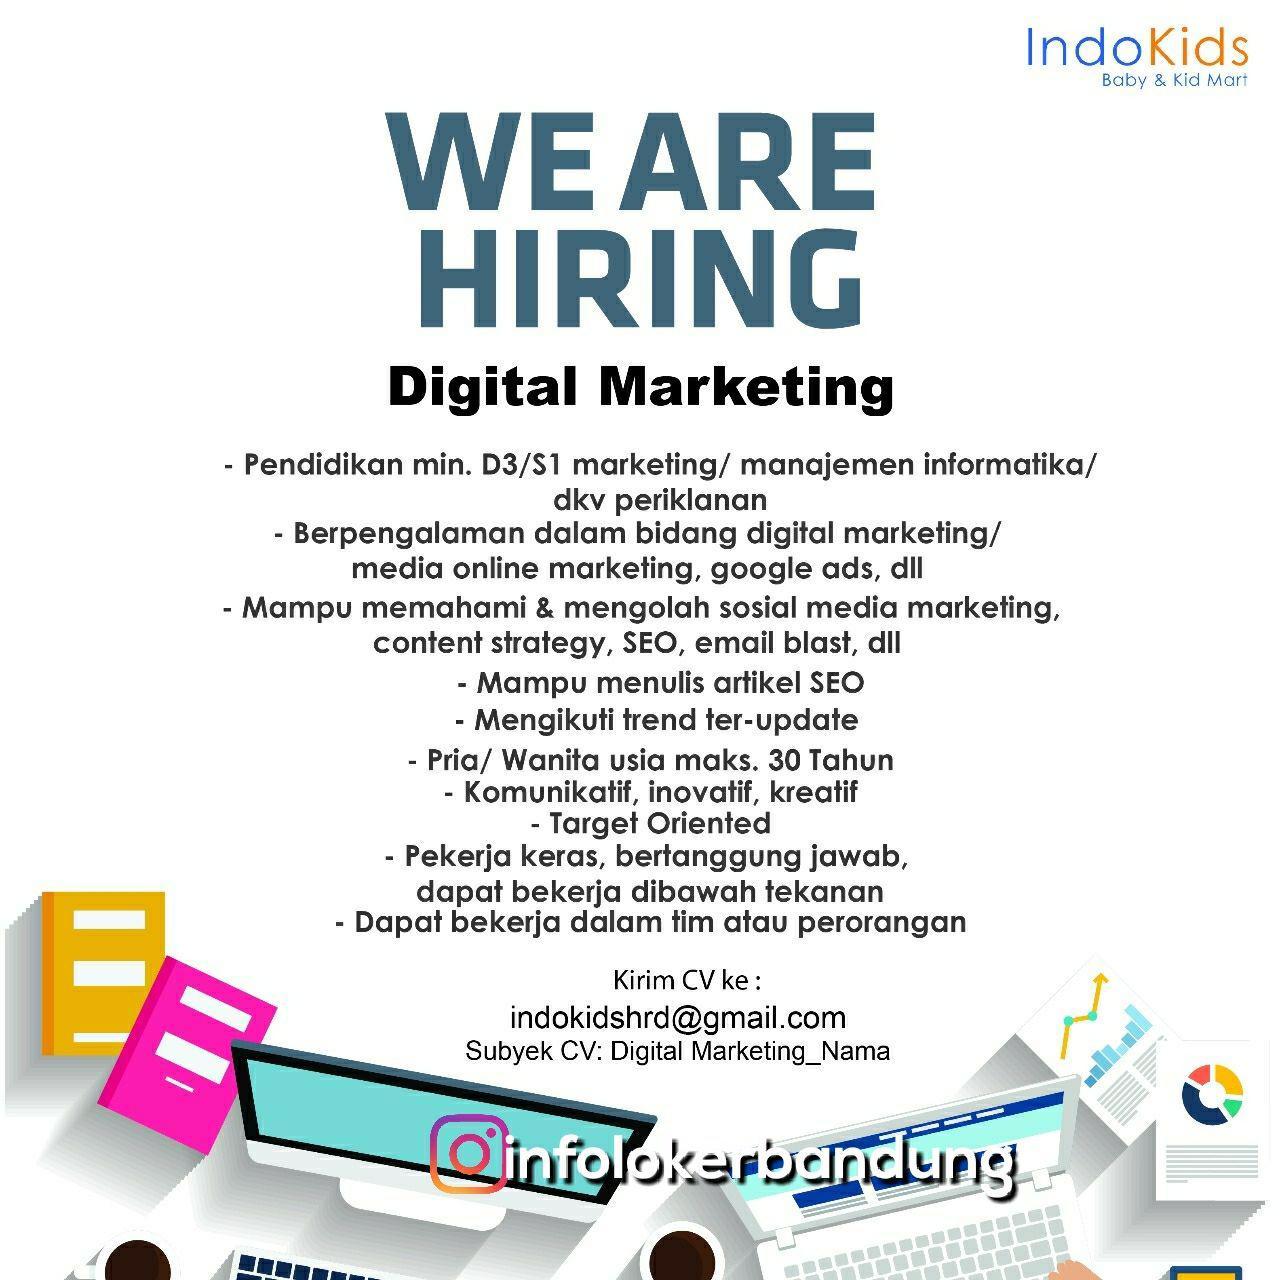 Lowongan Kerja Digital Marketing Indokids Bandung Februari 2018